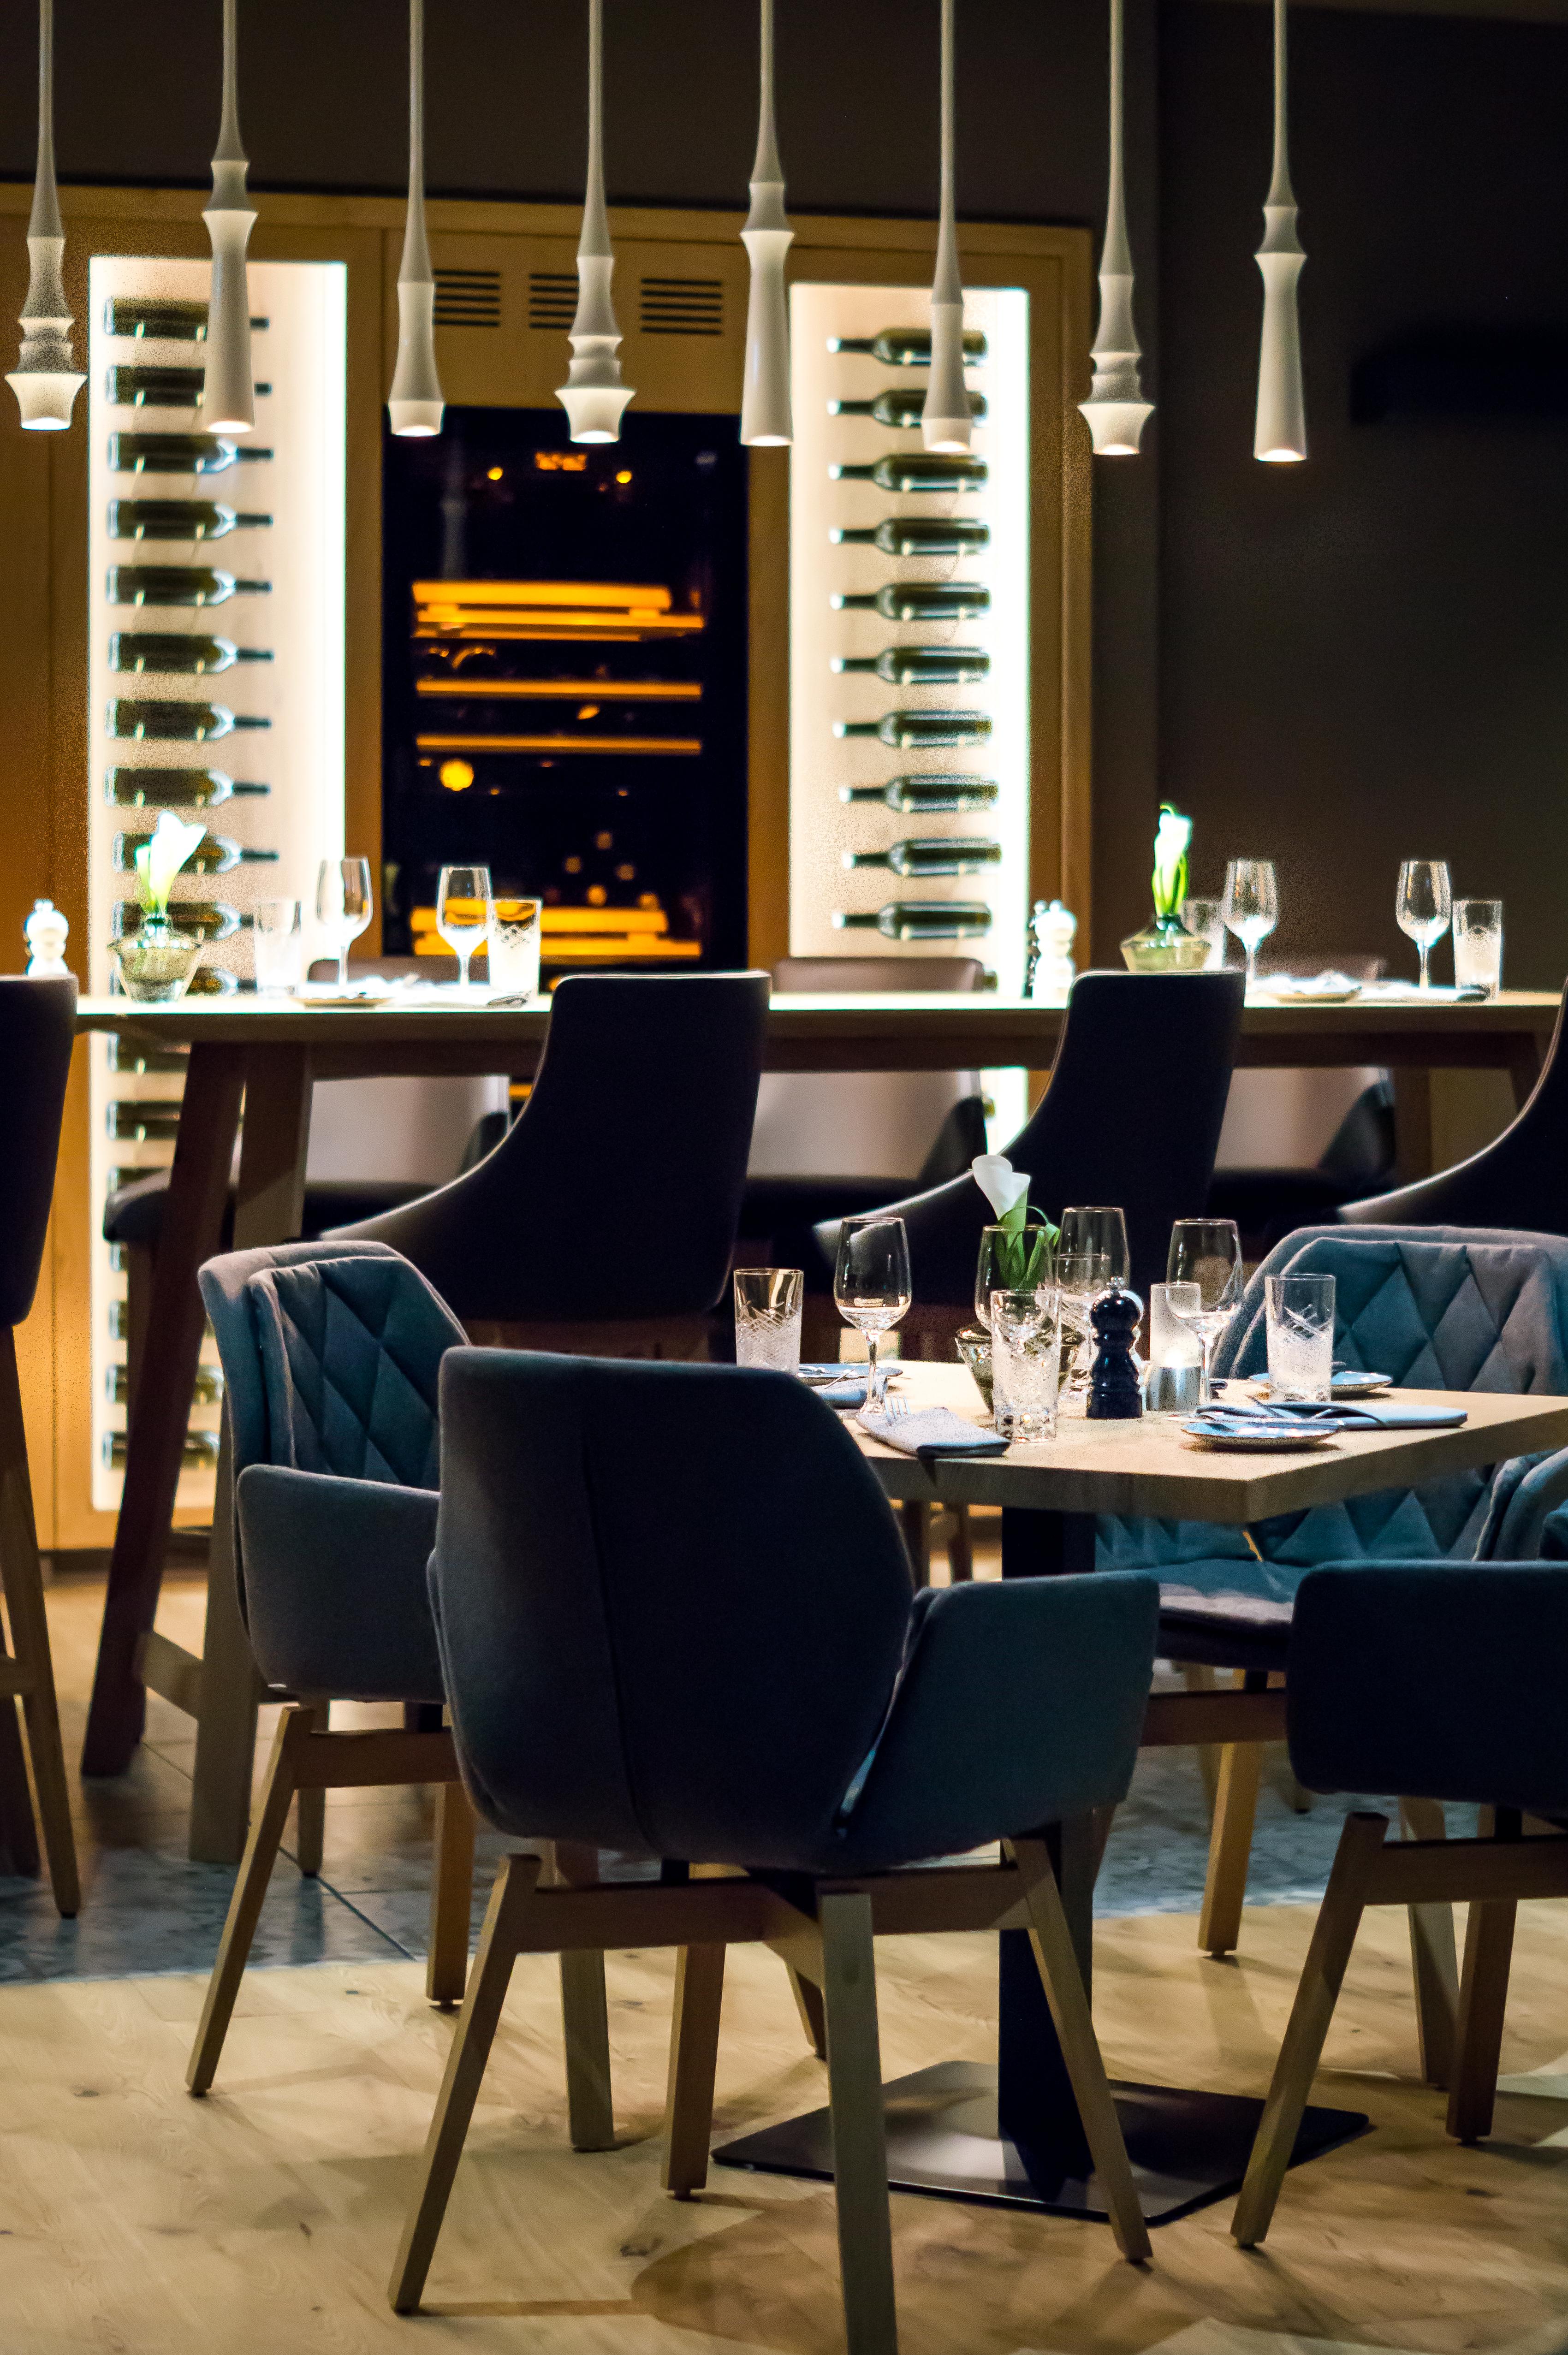 Frais De Table De Bar Cuisine Schème